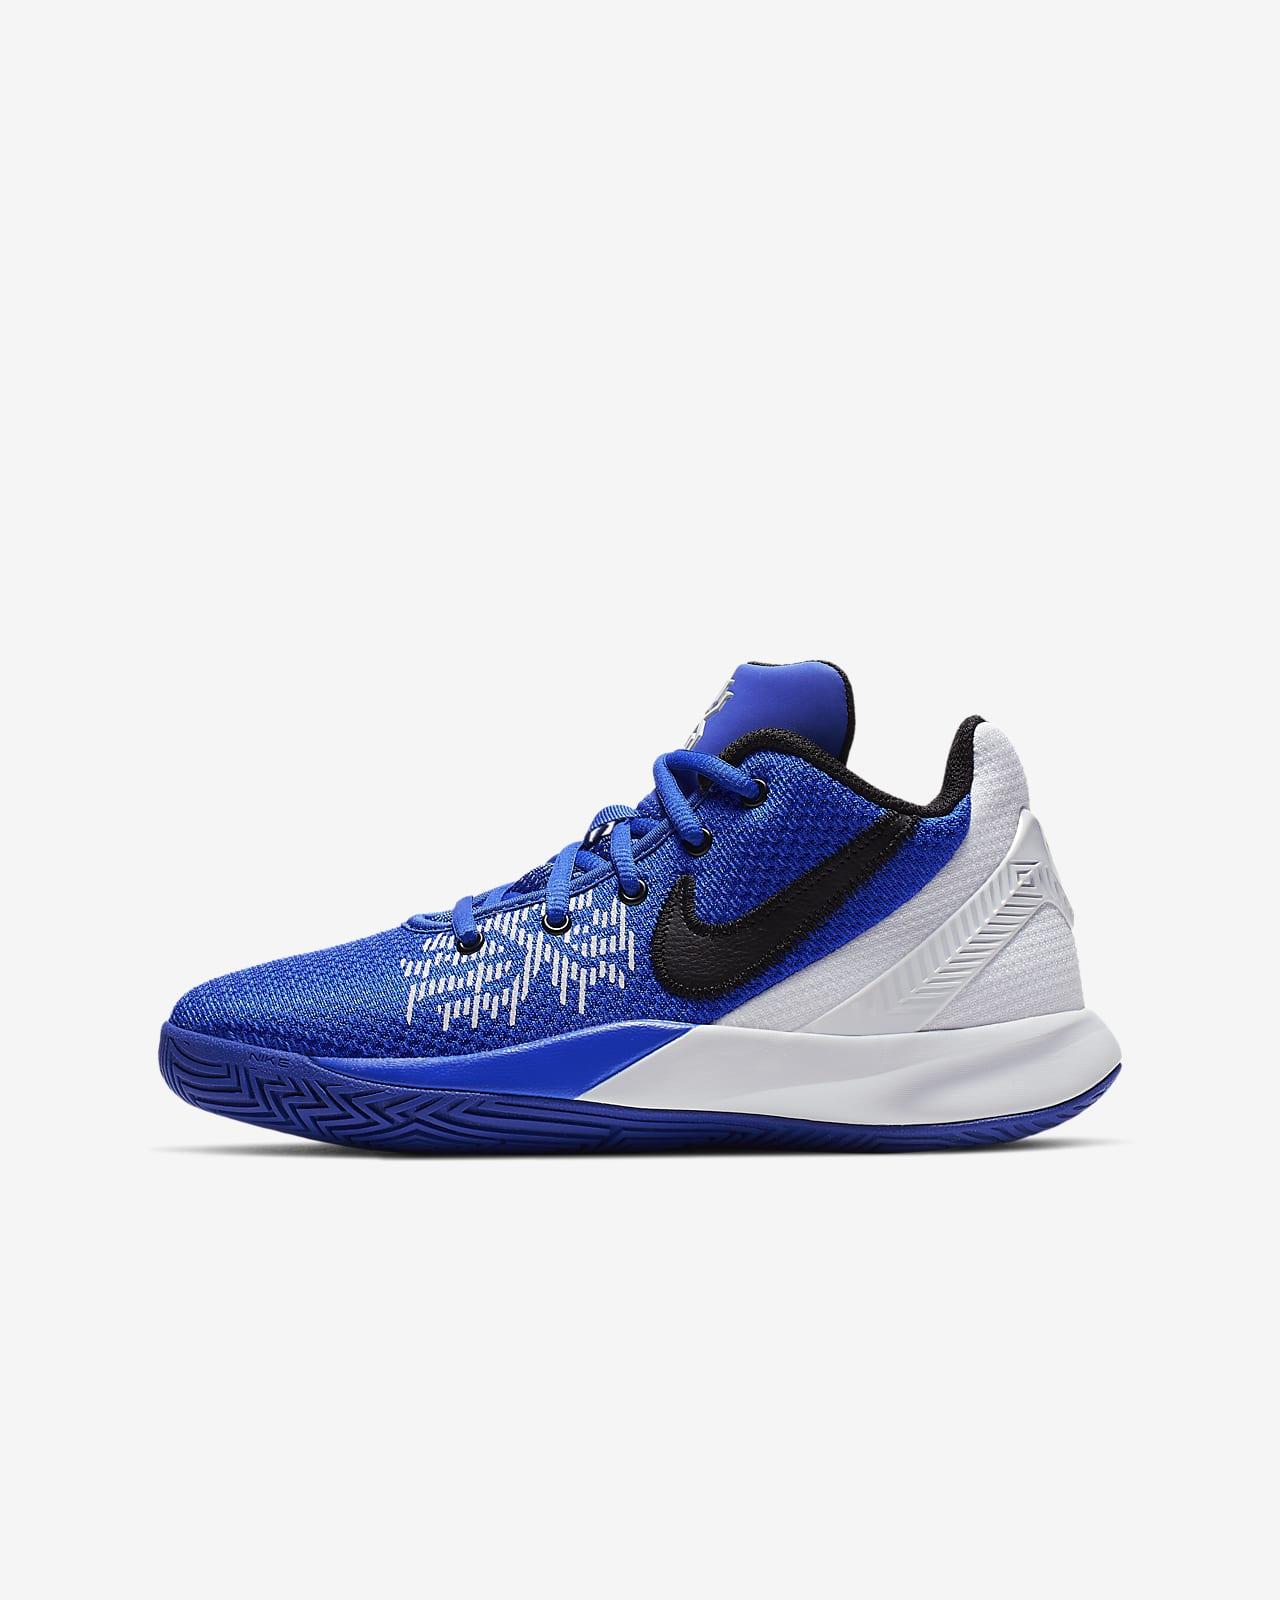 recuperación presentar Agregar  Kyrie Flytrap II Big Kids' Basketball Shoe. Nike.com